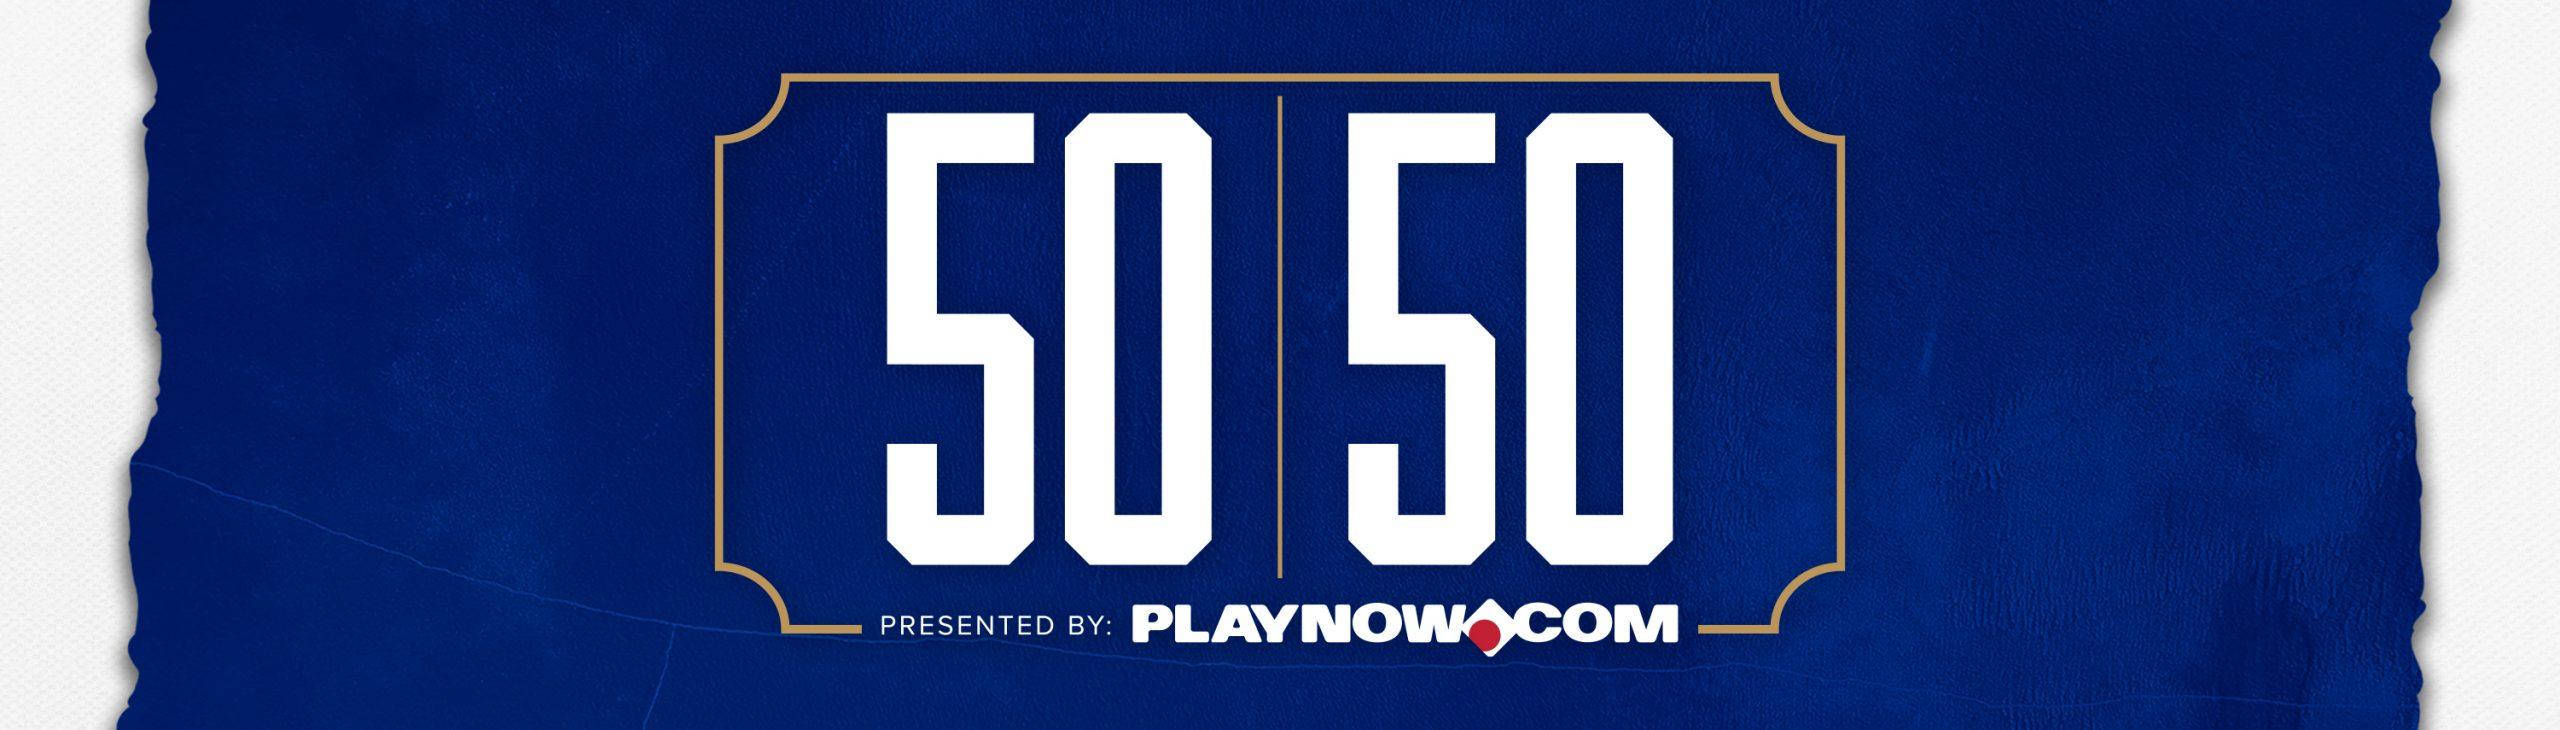 Winnipeg Blue Bombers 50/50